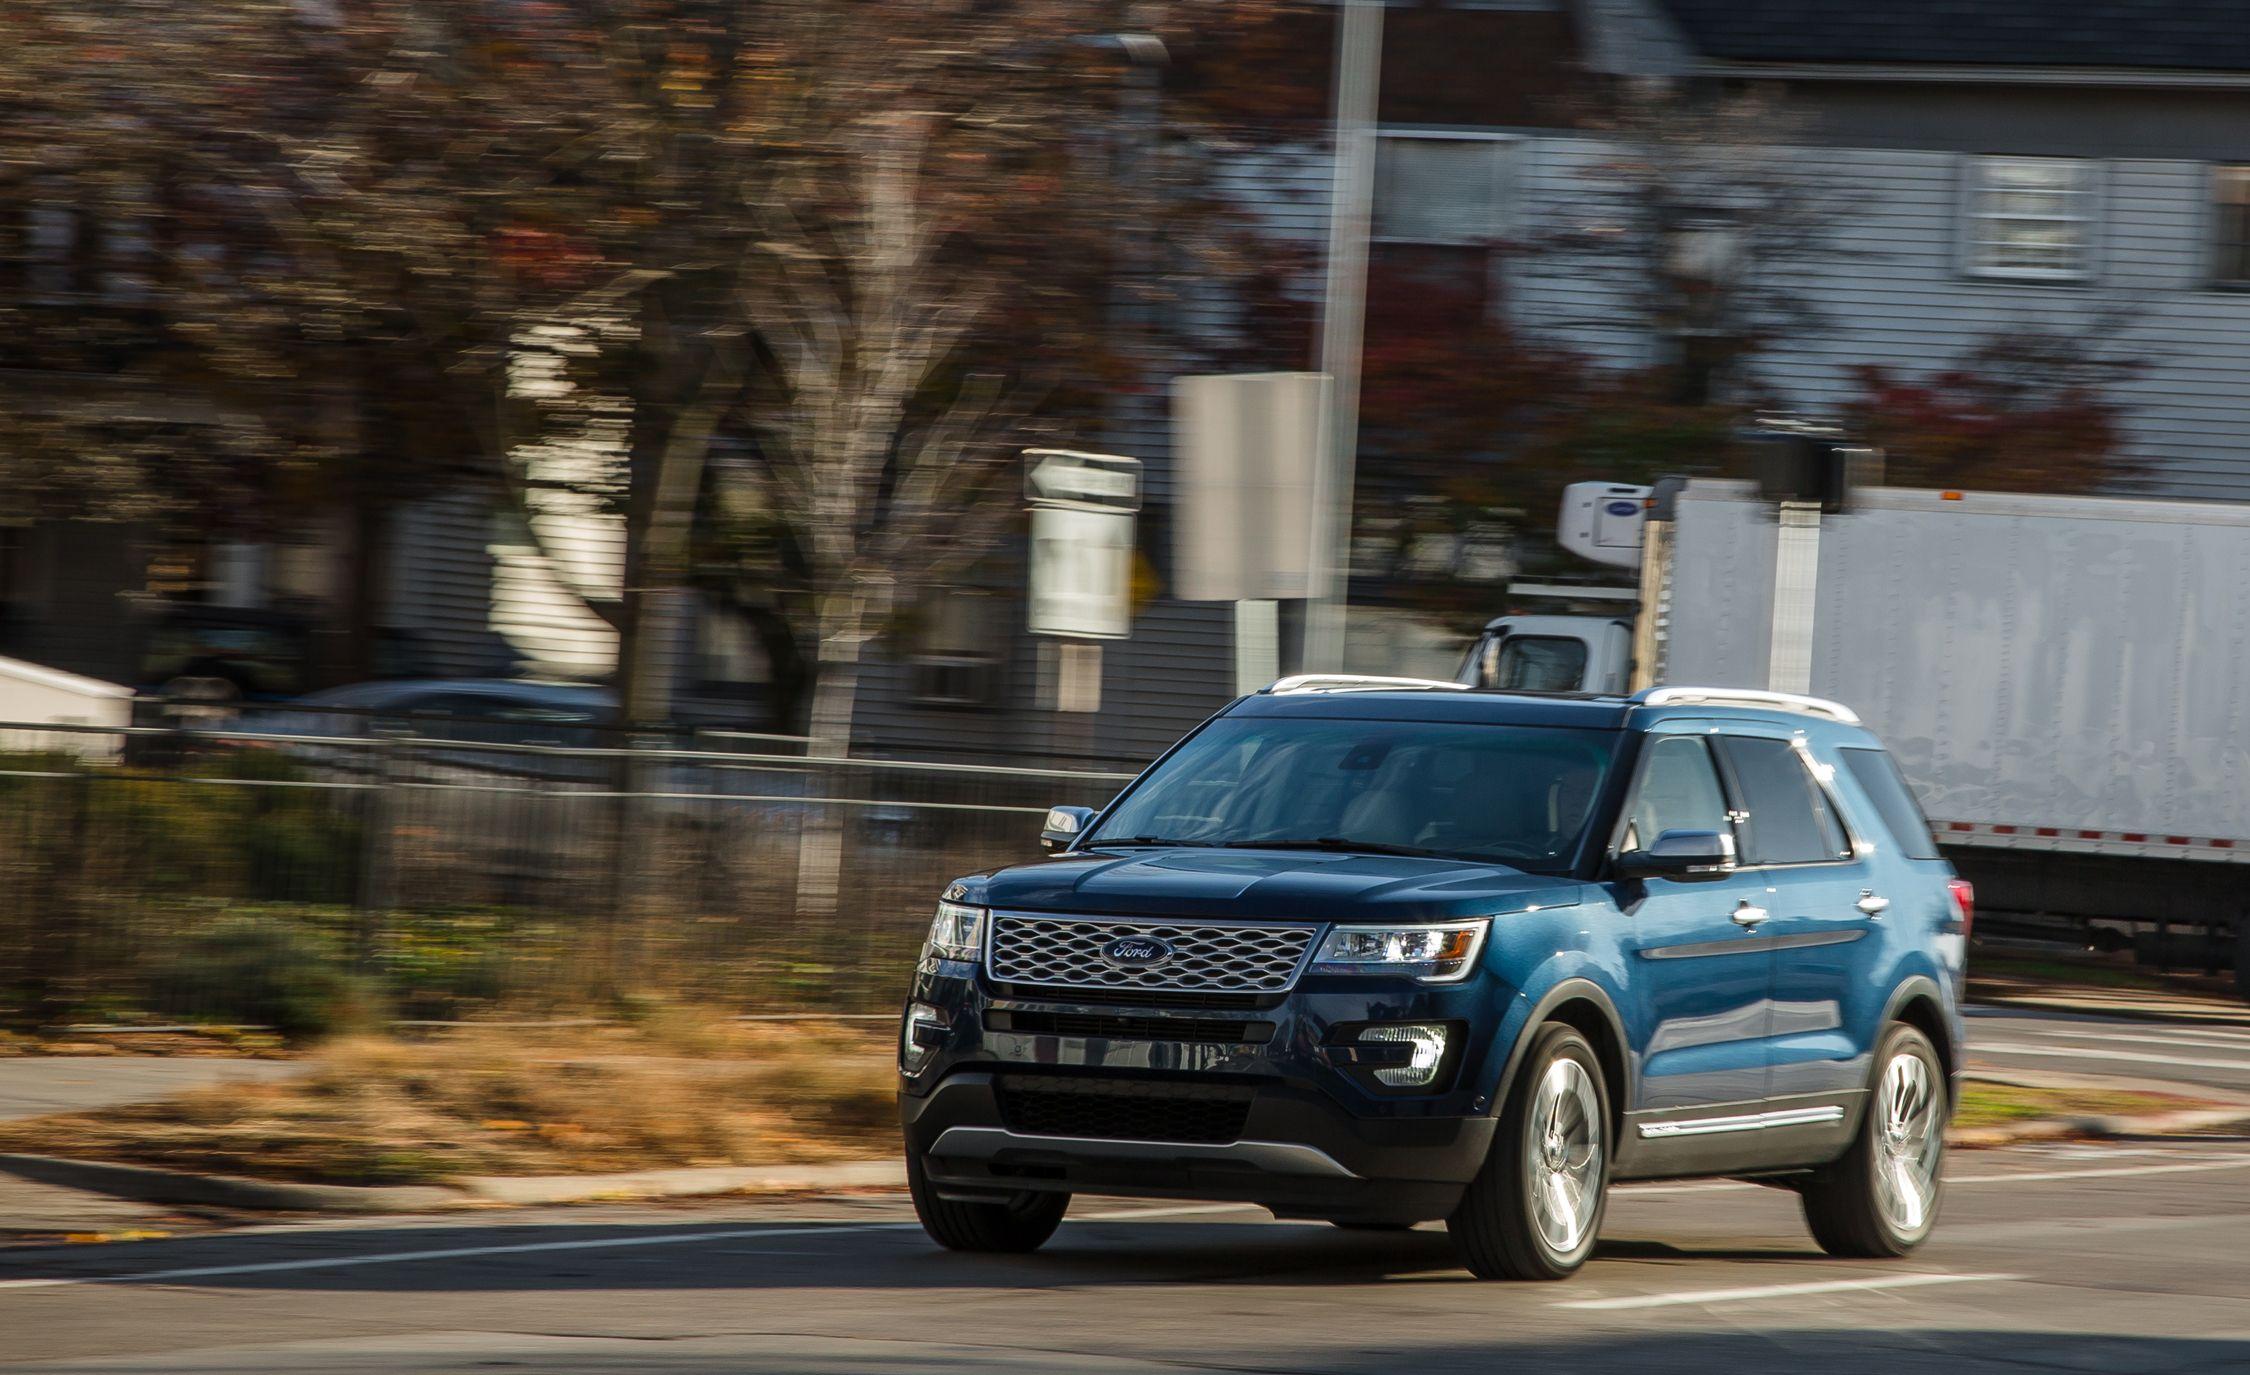 & 2017 Ford Explorer | In-Depth Model Review | Car and Driver markmcfarlin.com